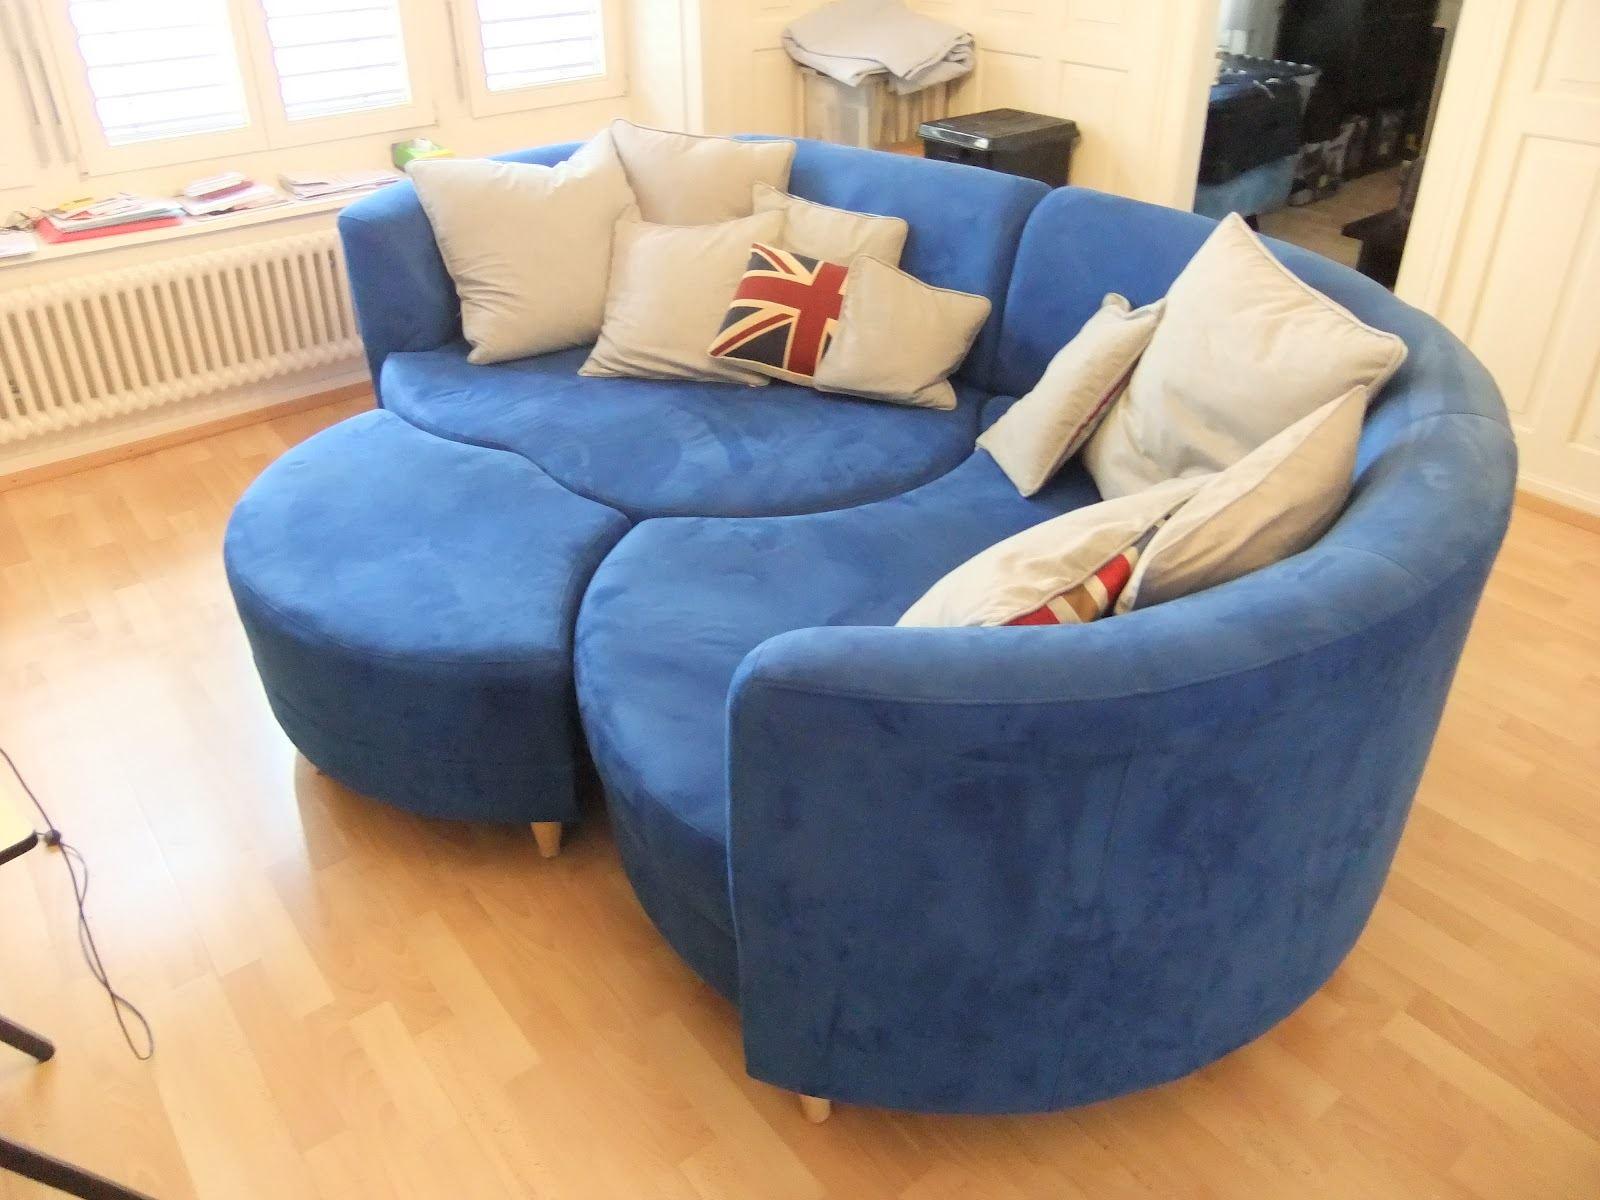 Круглый синий диван